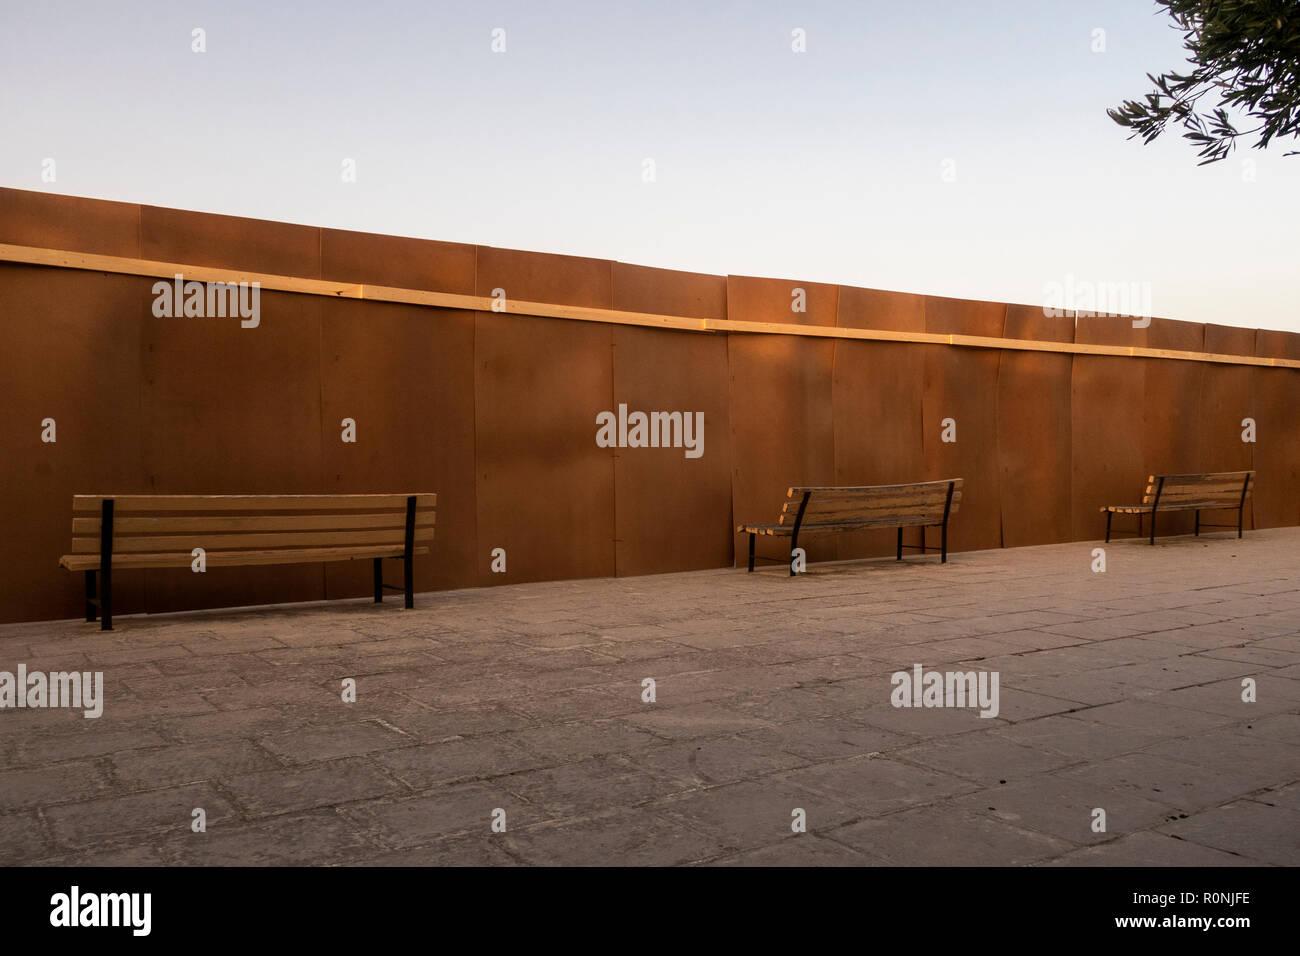 4 benches facing a fence, Malta - Stock Image